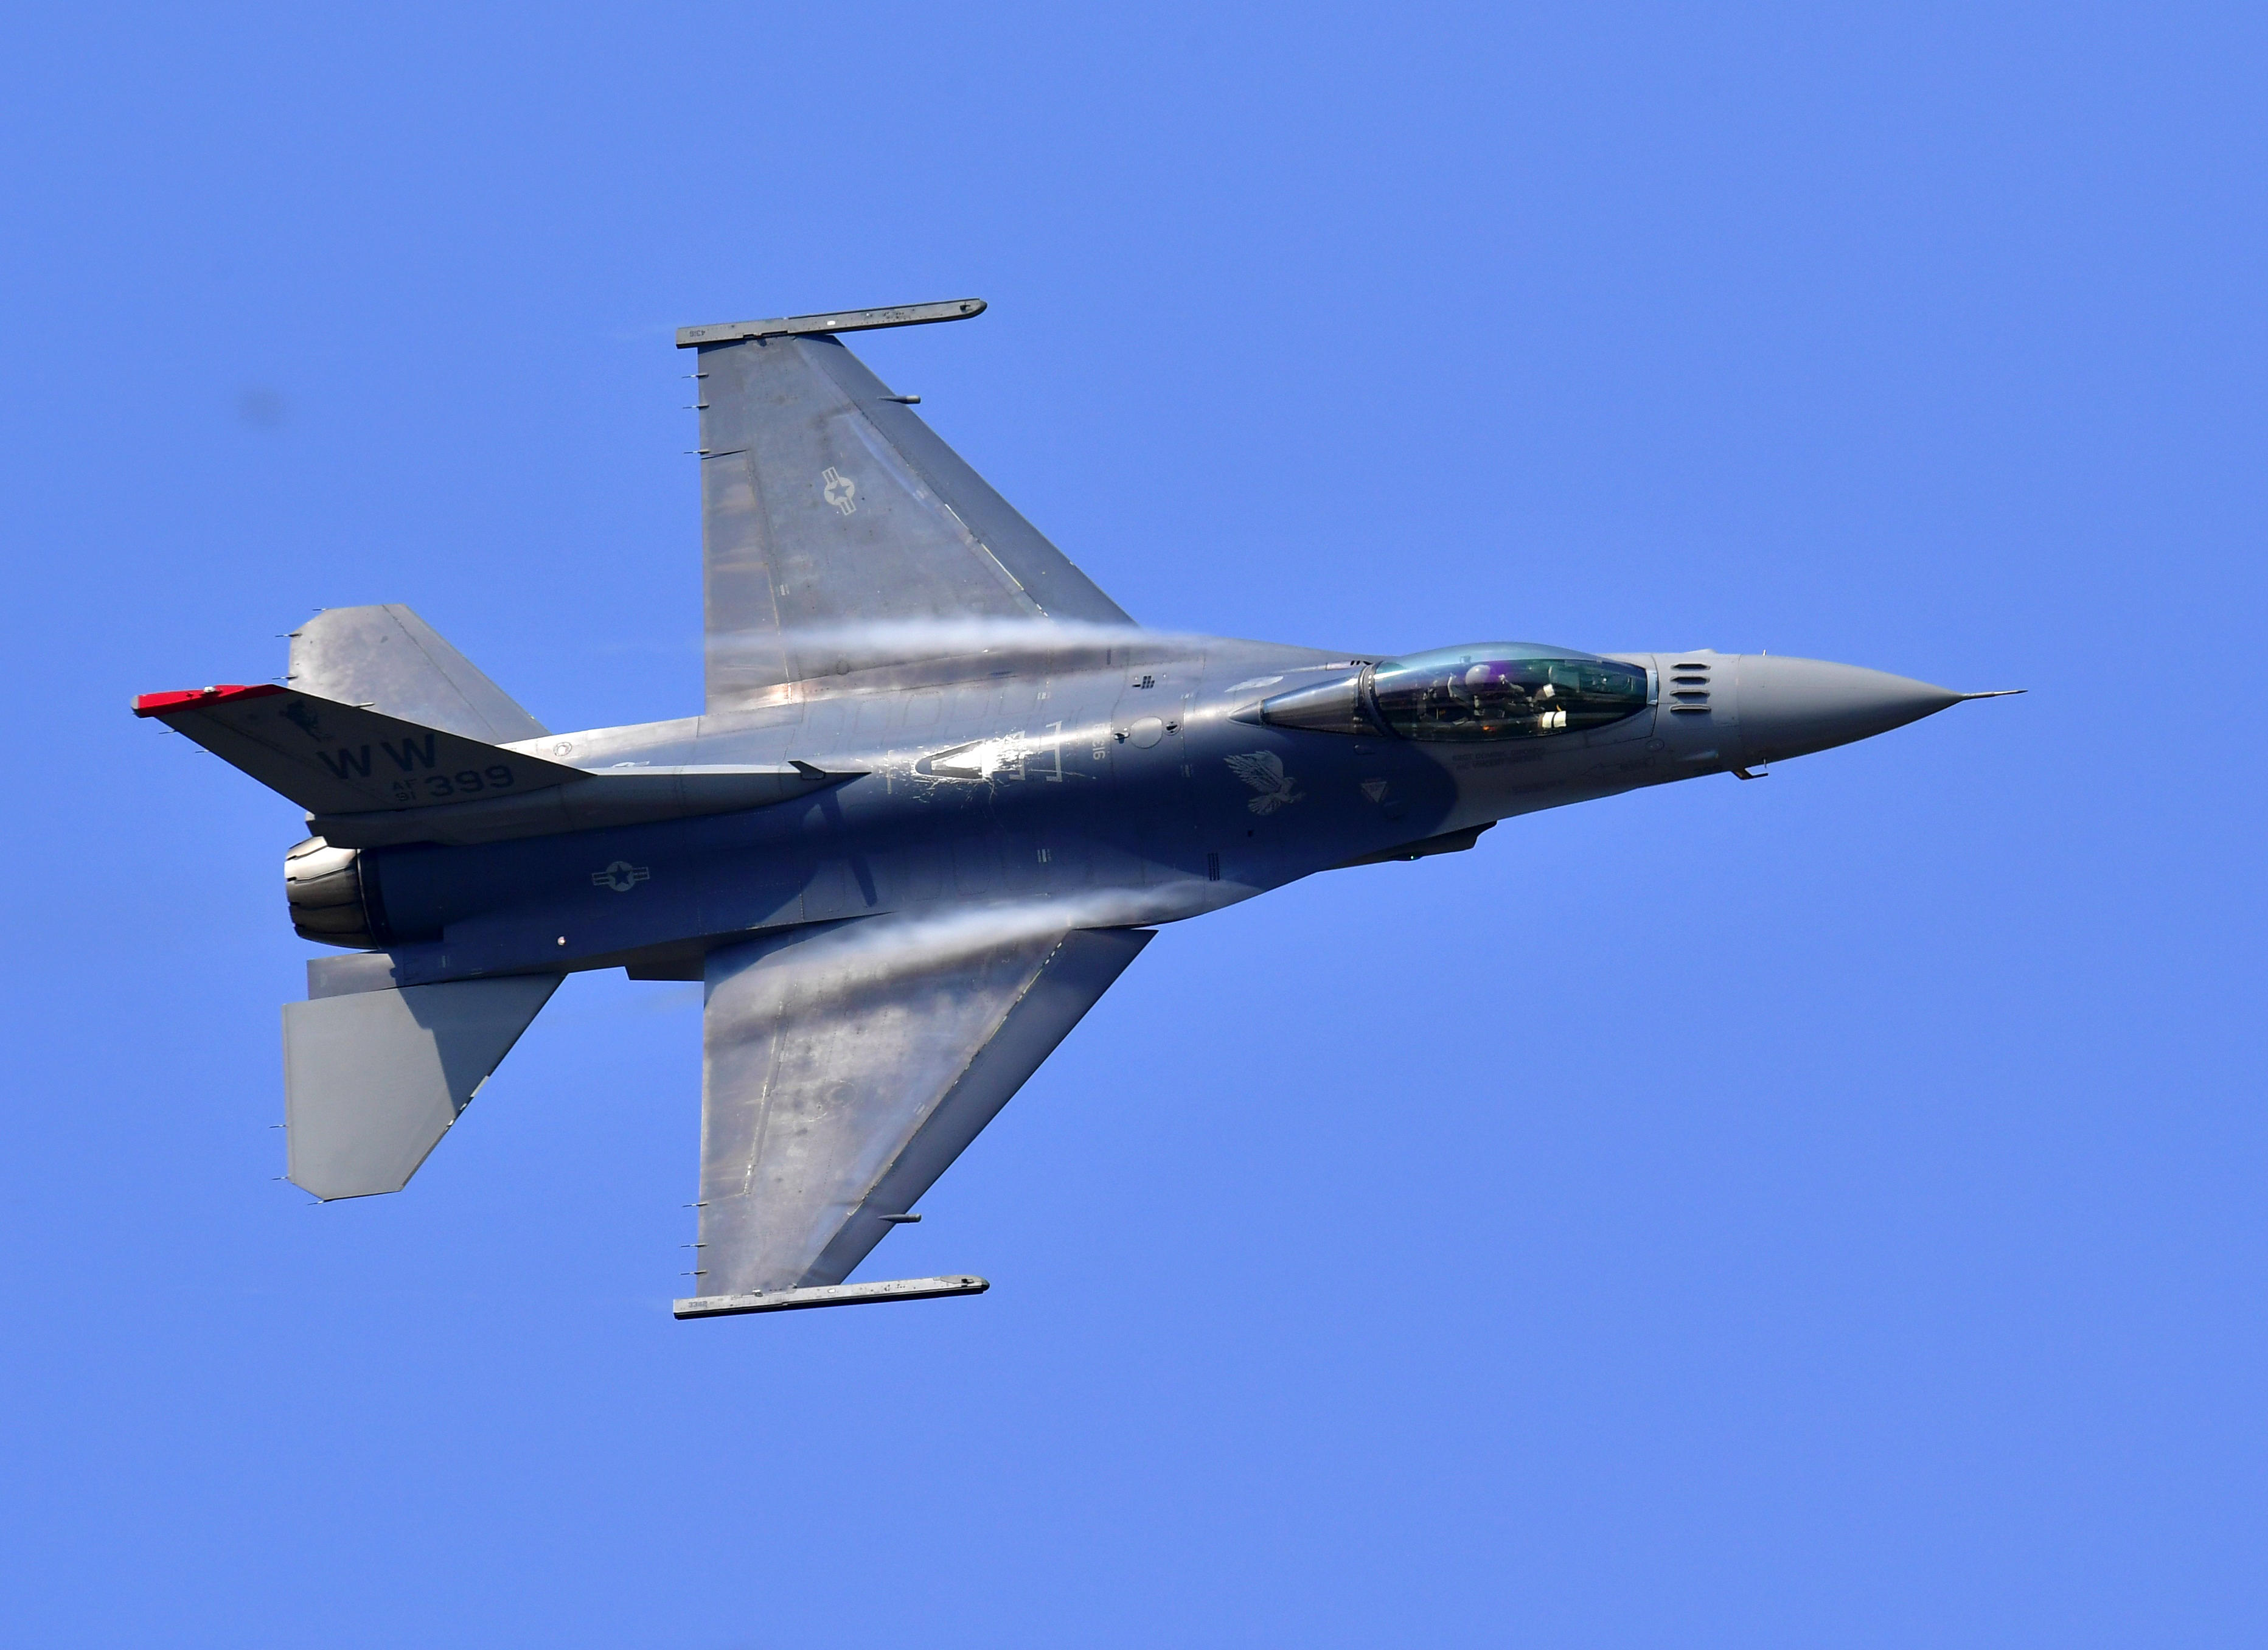 c2c496a66b750 U.S. Air Force fighter jet intercepts plane near Trump golf course